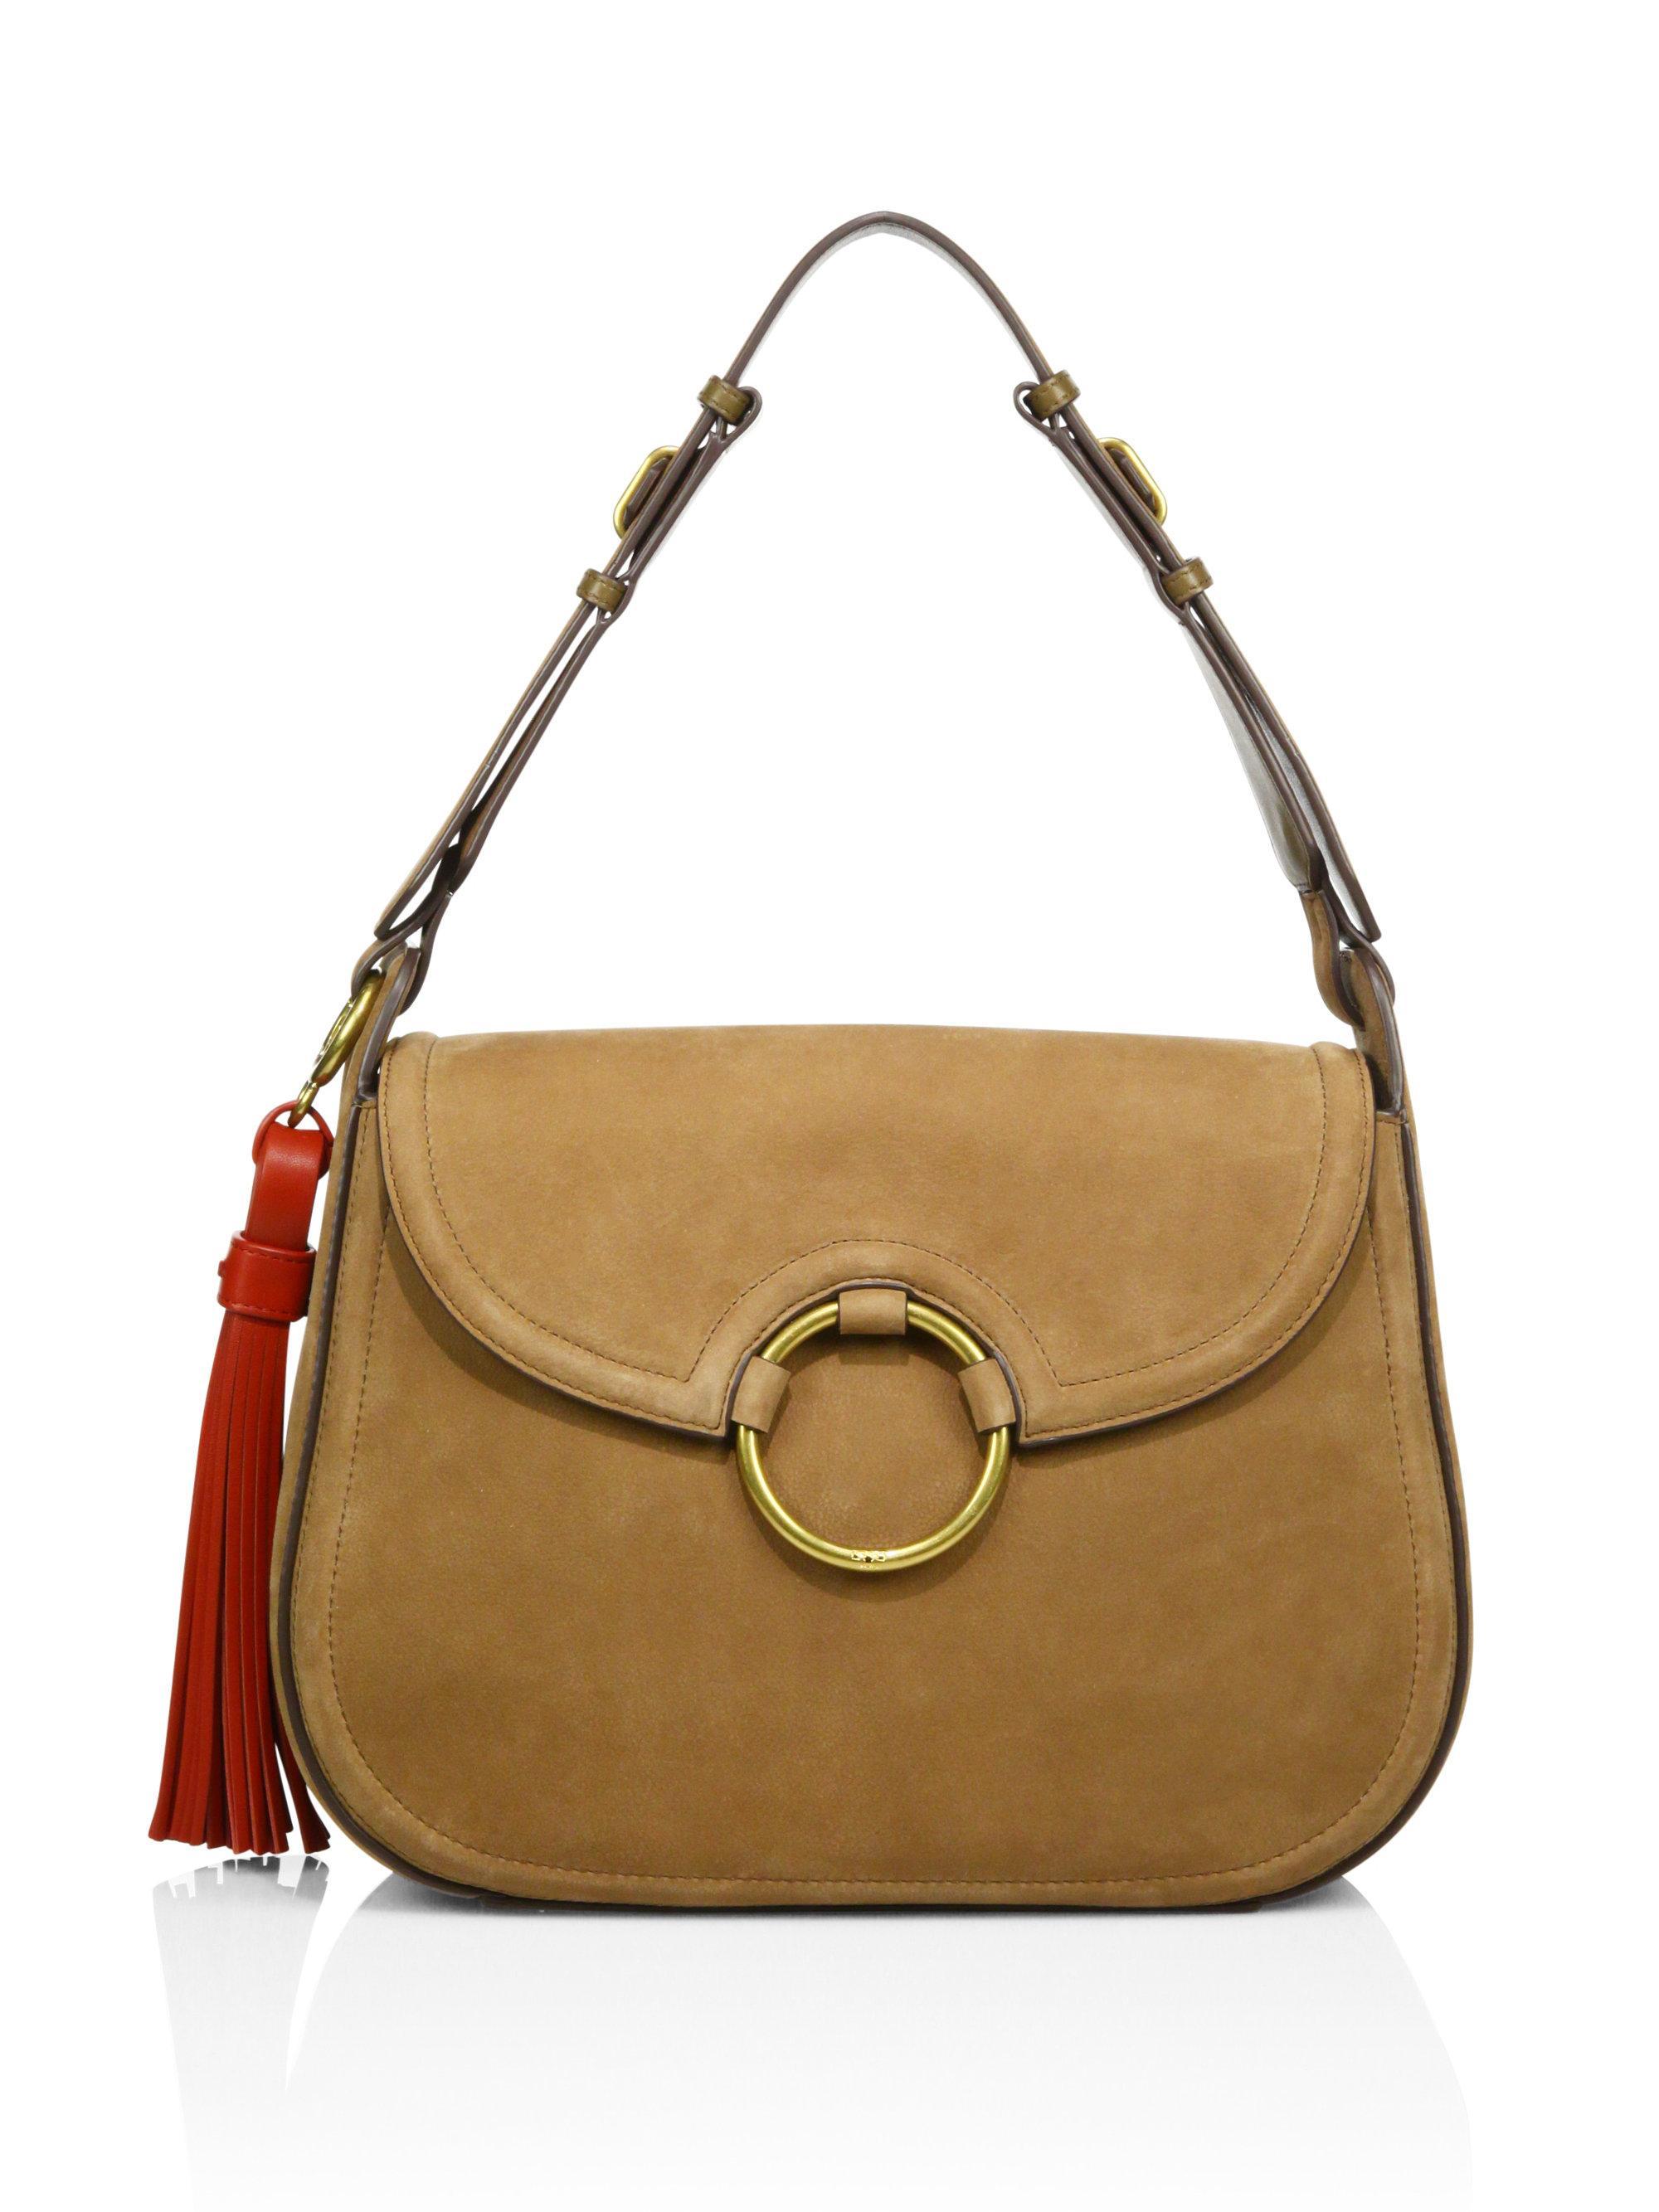 6b891ba0e27 Lyst - Tory Burch Tassel Suede Large Shoulder Bag